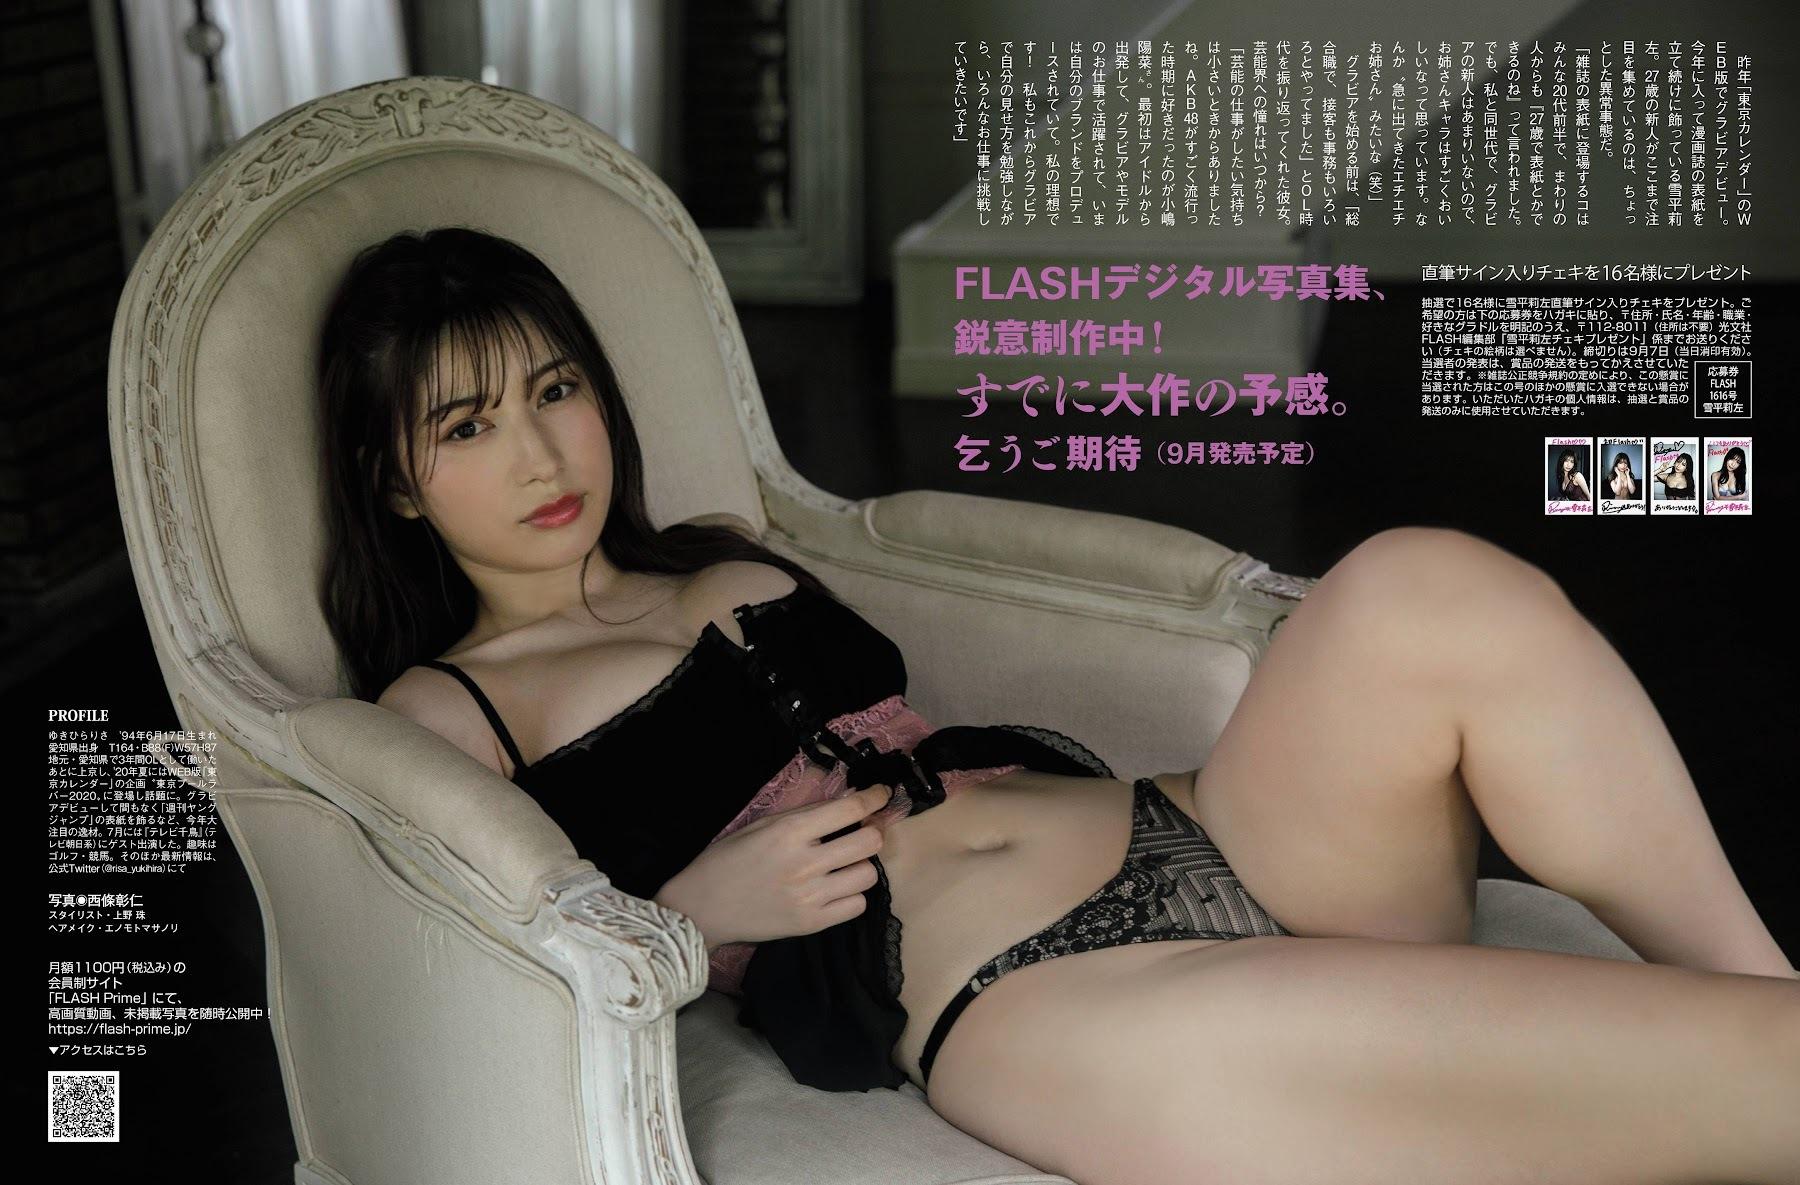 enako 雪平莉左-FLASH 2021年9月14日刊 高清套图 第21张